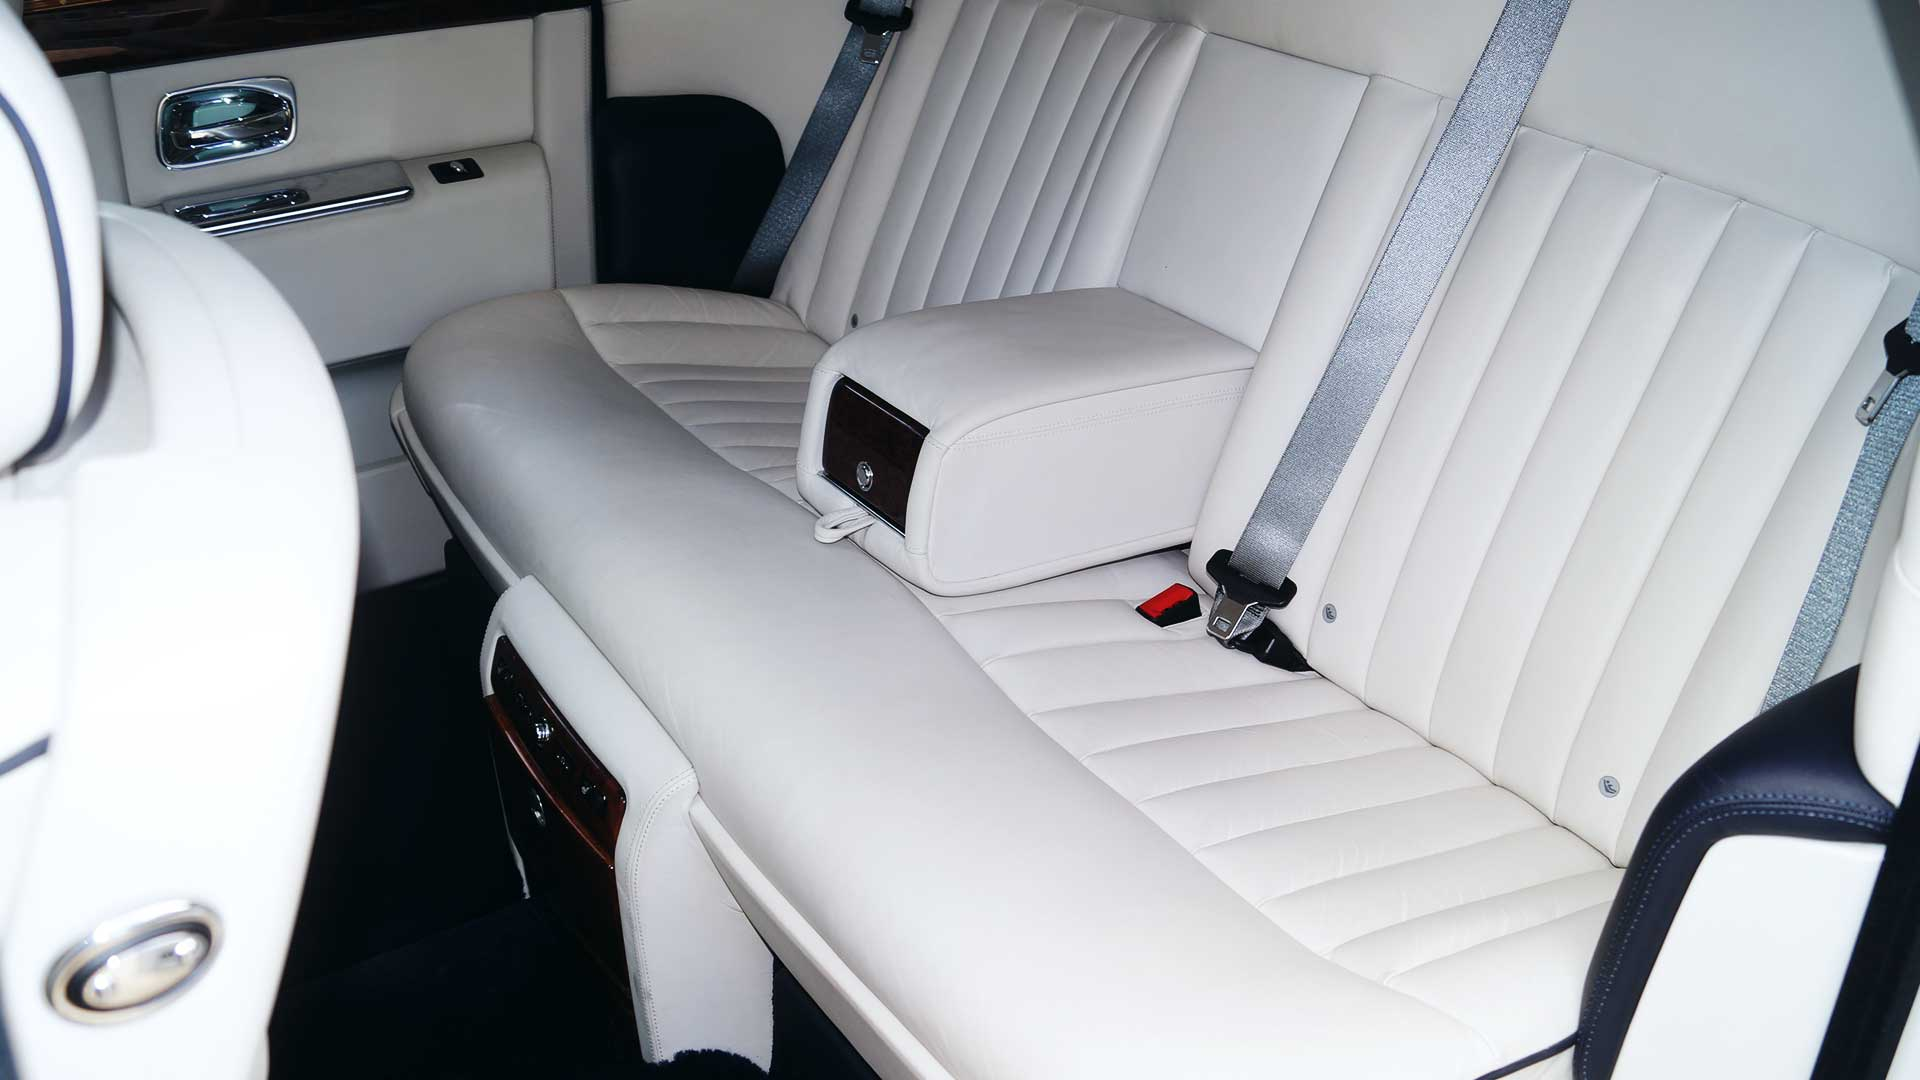 Rolls-Royce Phantom - Rear Seating